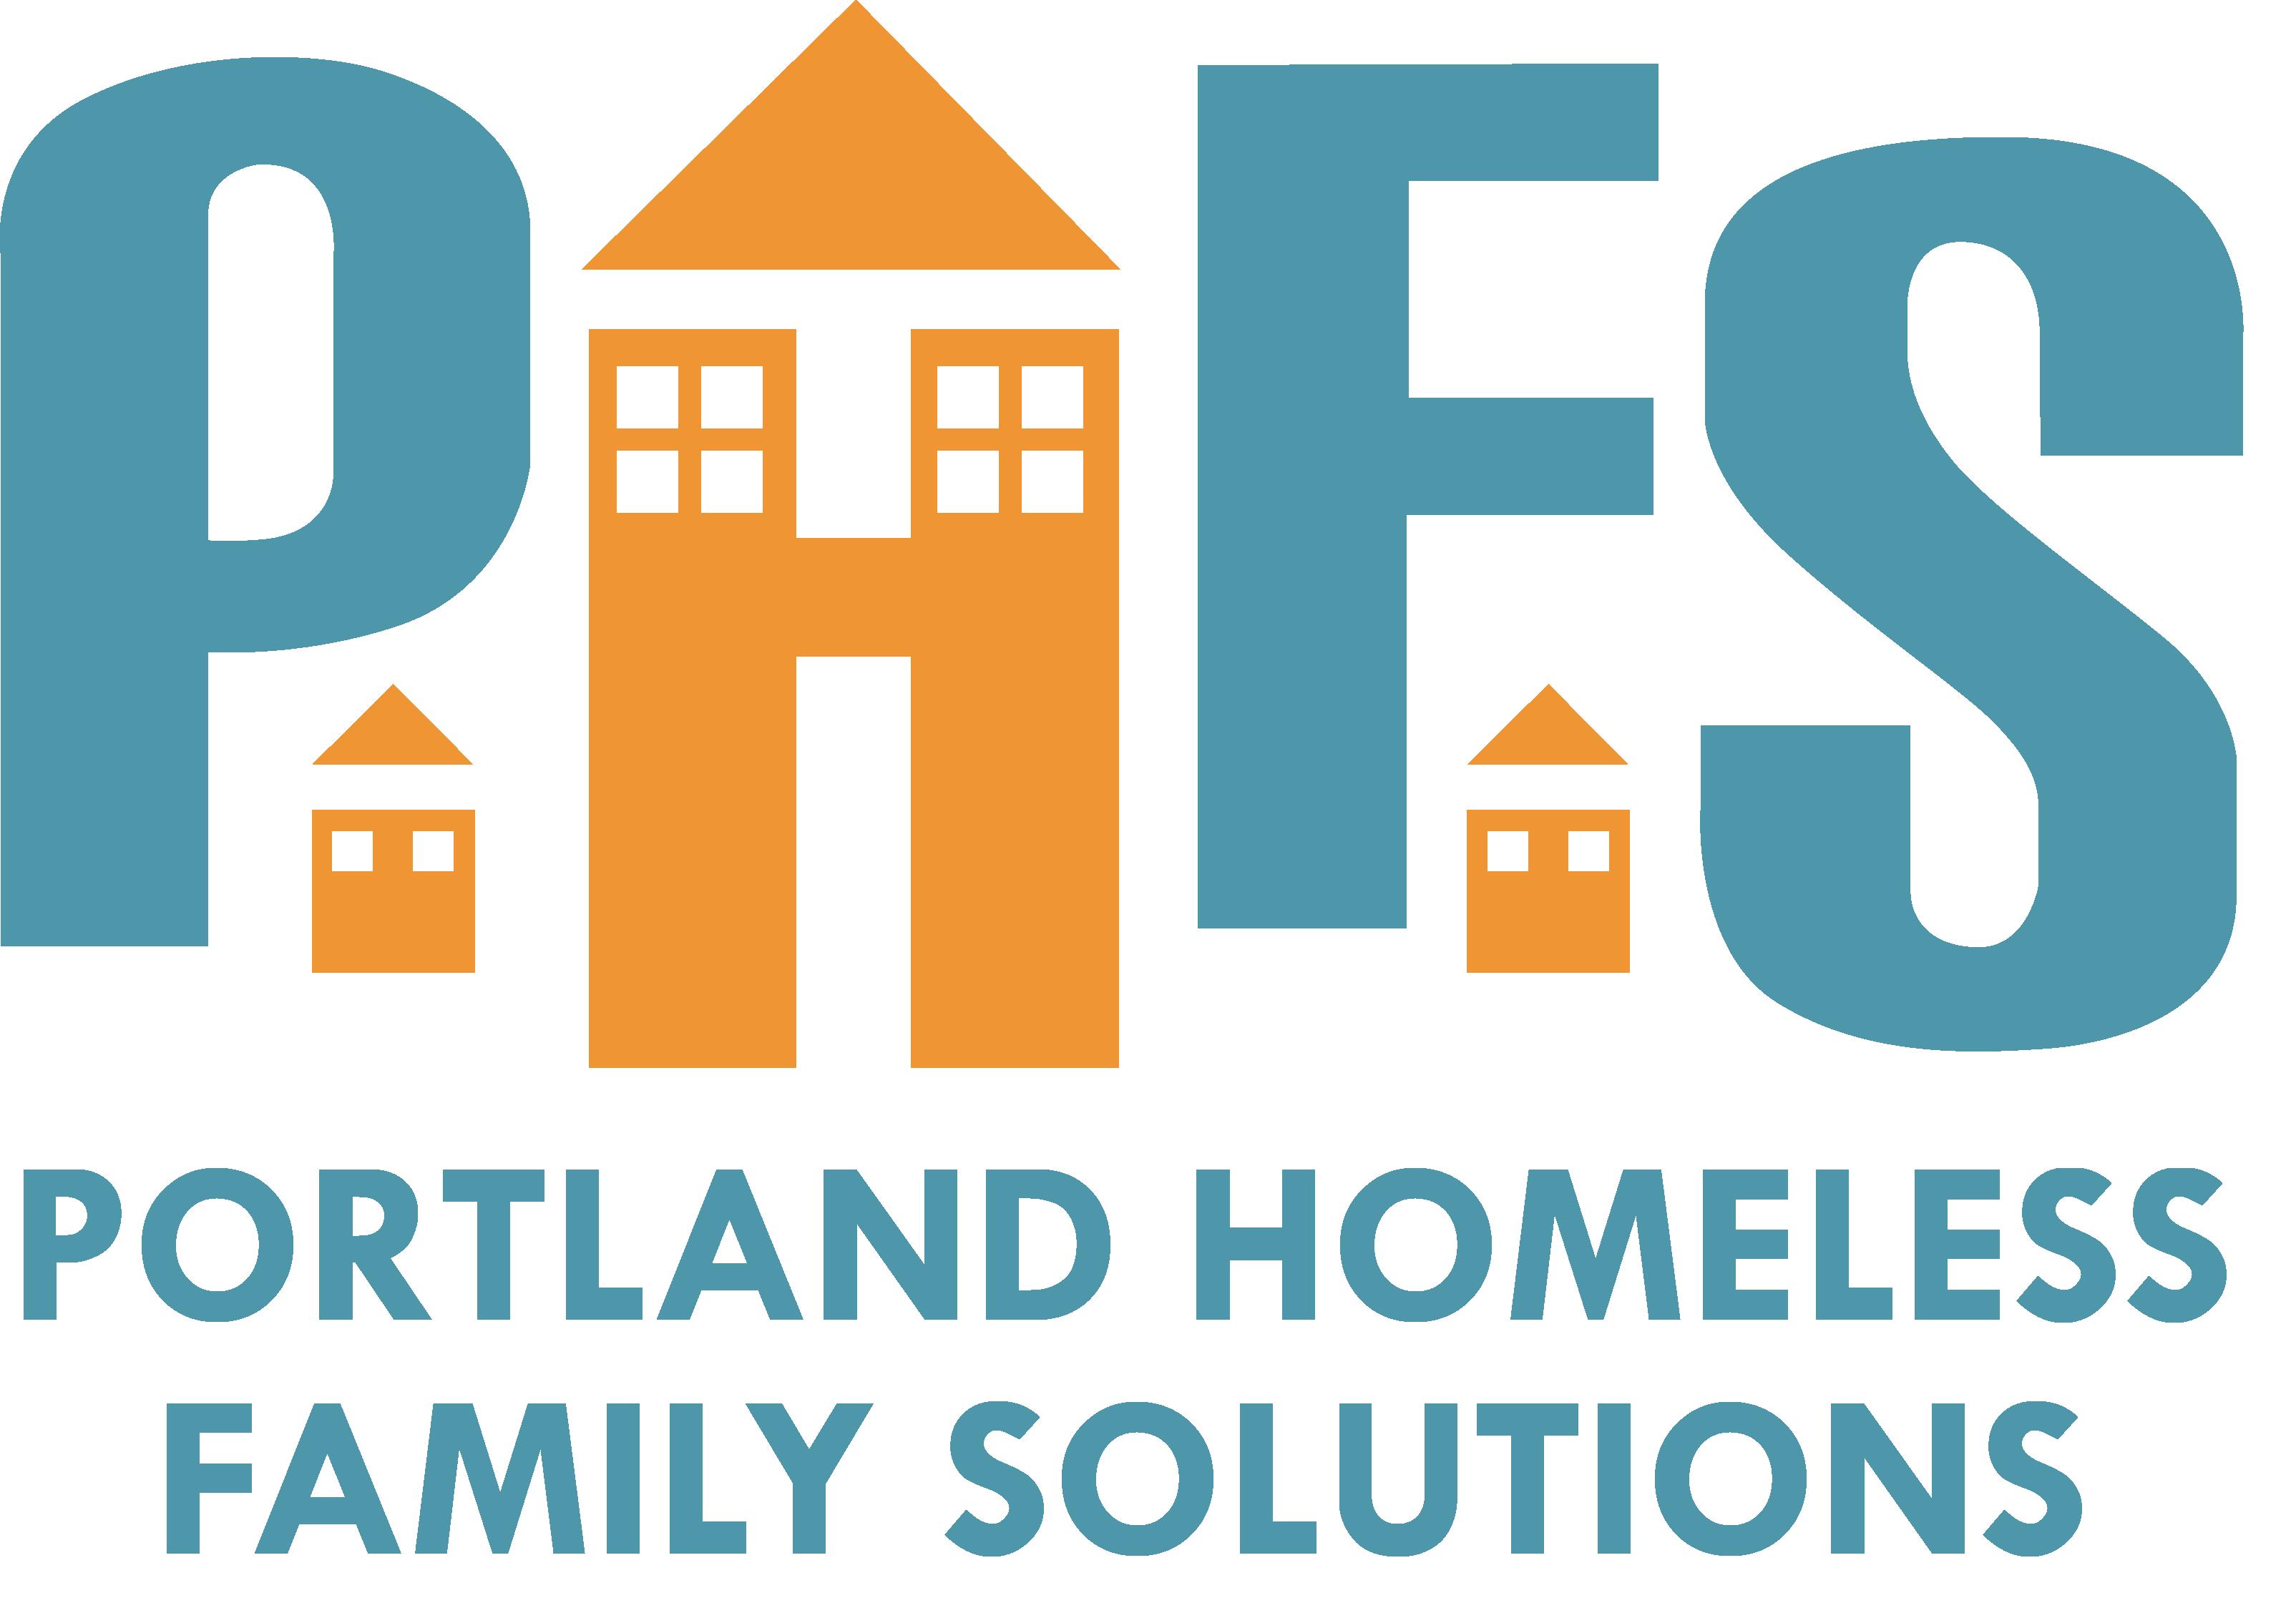 portlandhomelessfamilysolutions